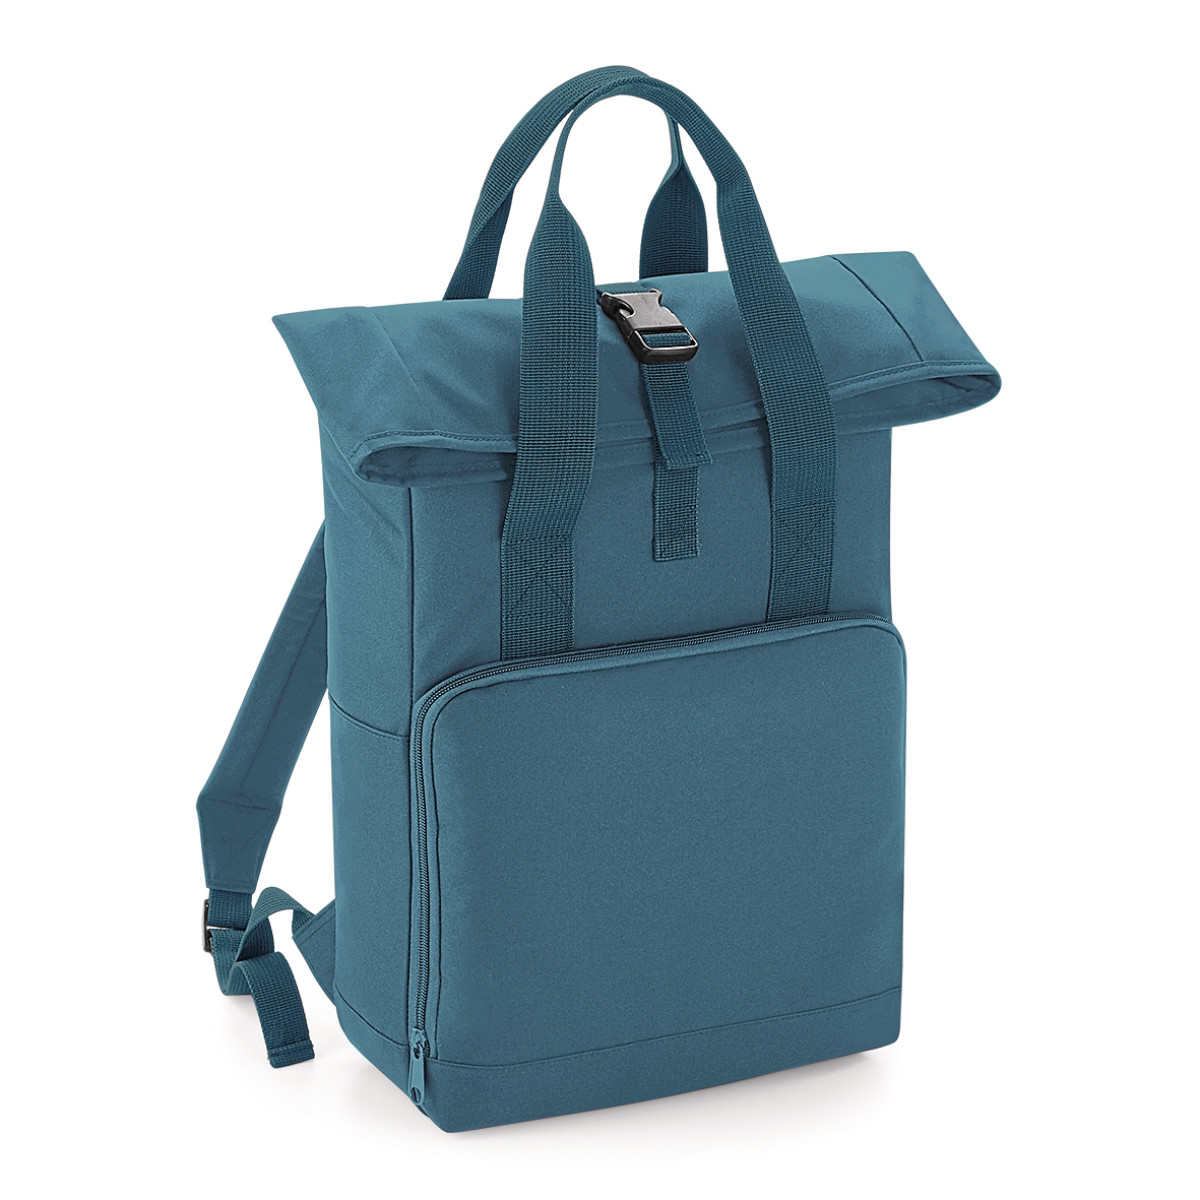 Bagbase Twin Handle Roll-Top Backpack